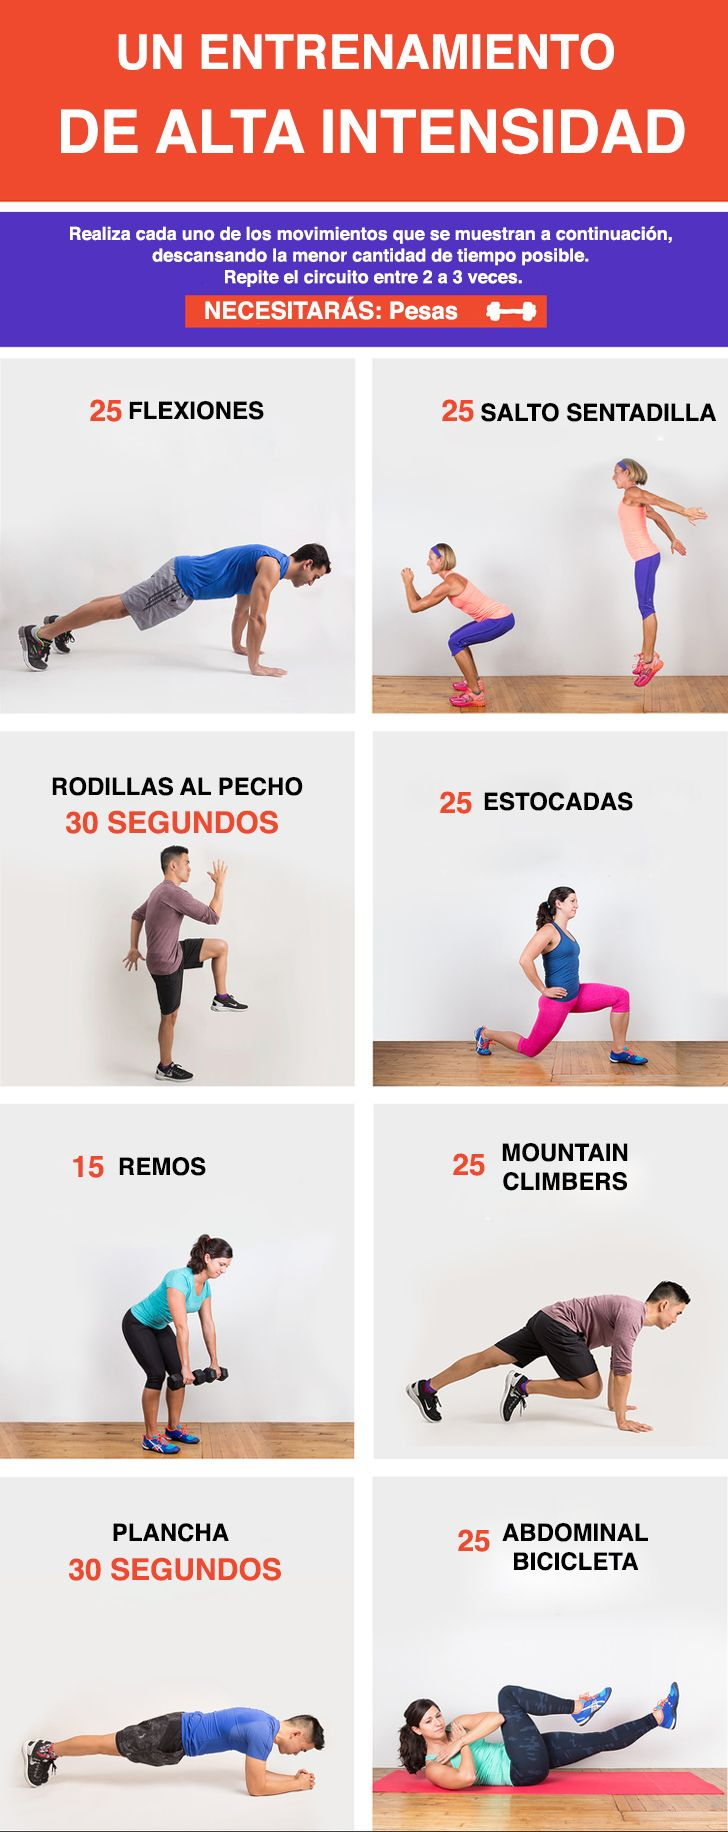 34+ Rutina completa de yoga para principiantes trends